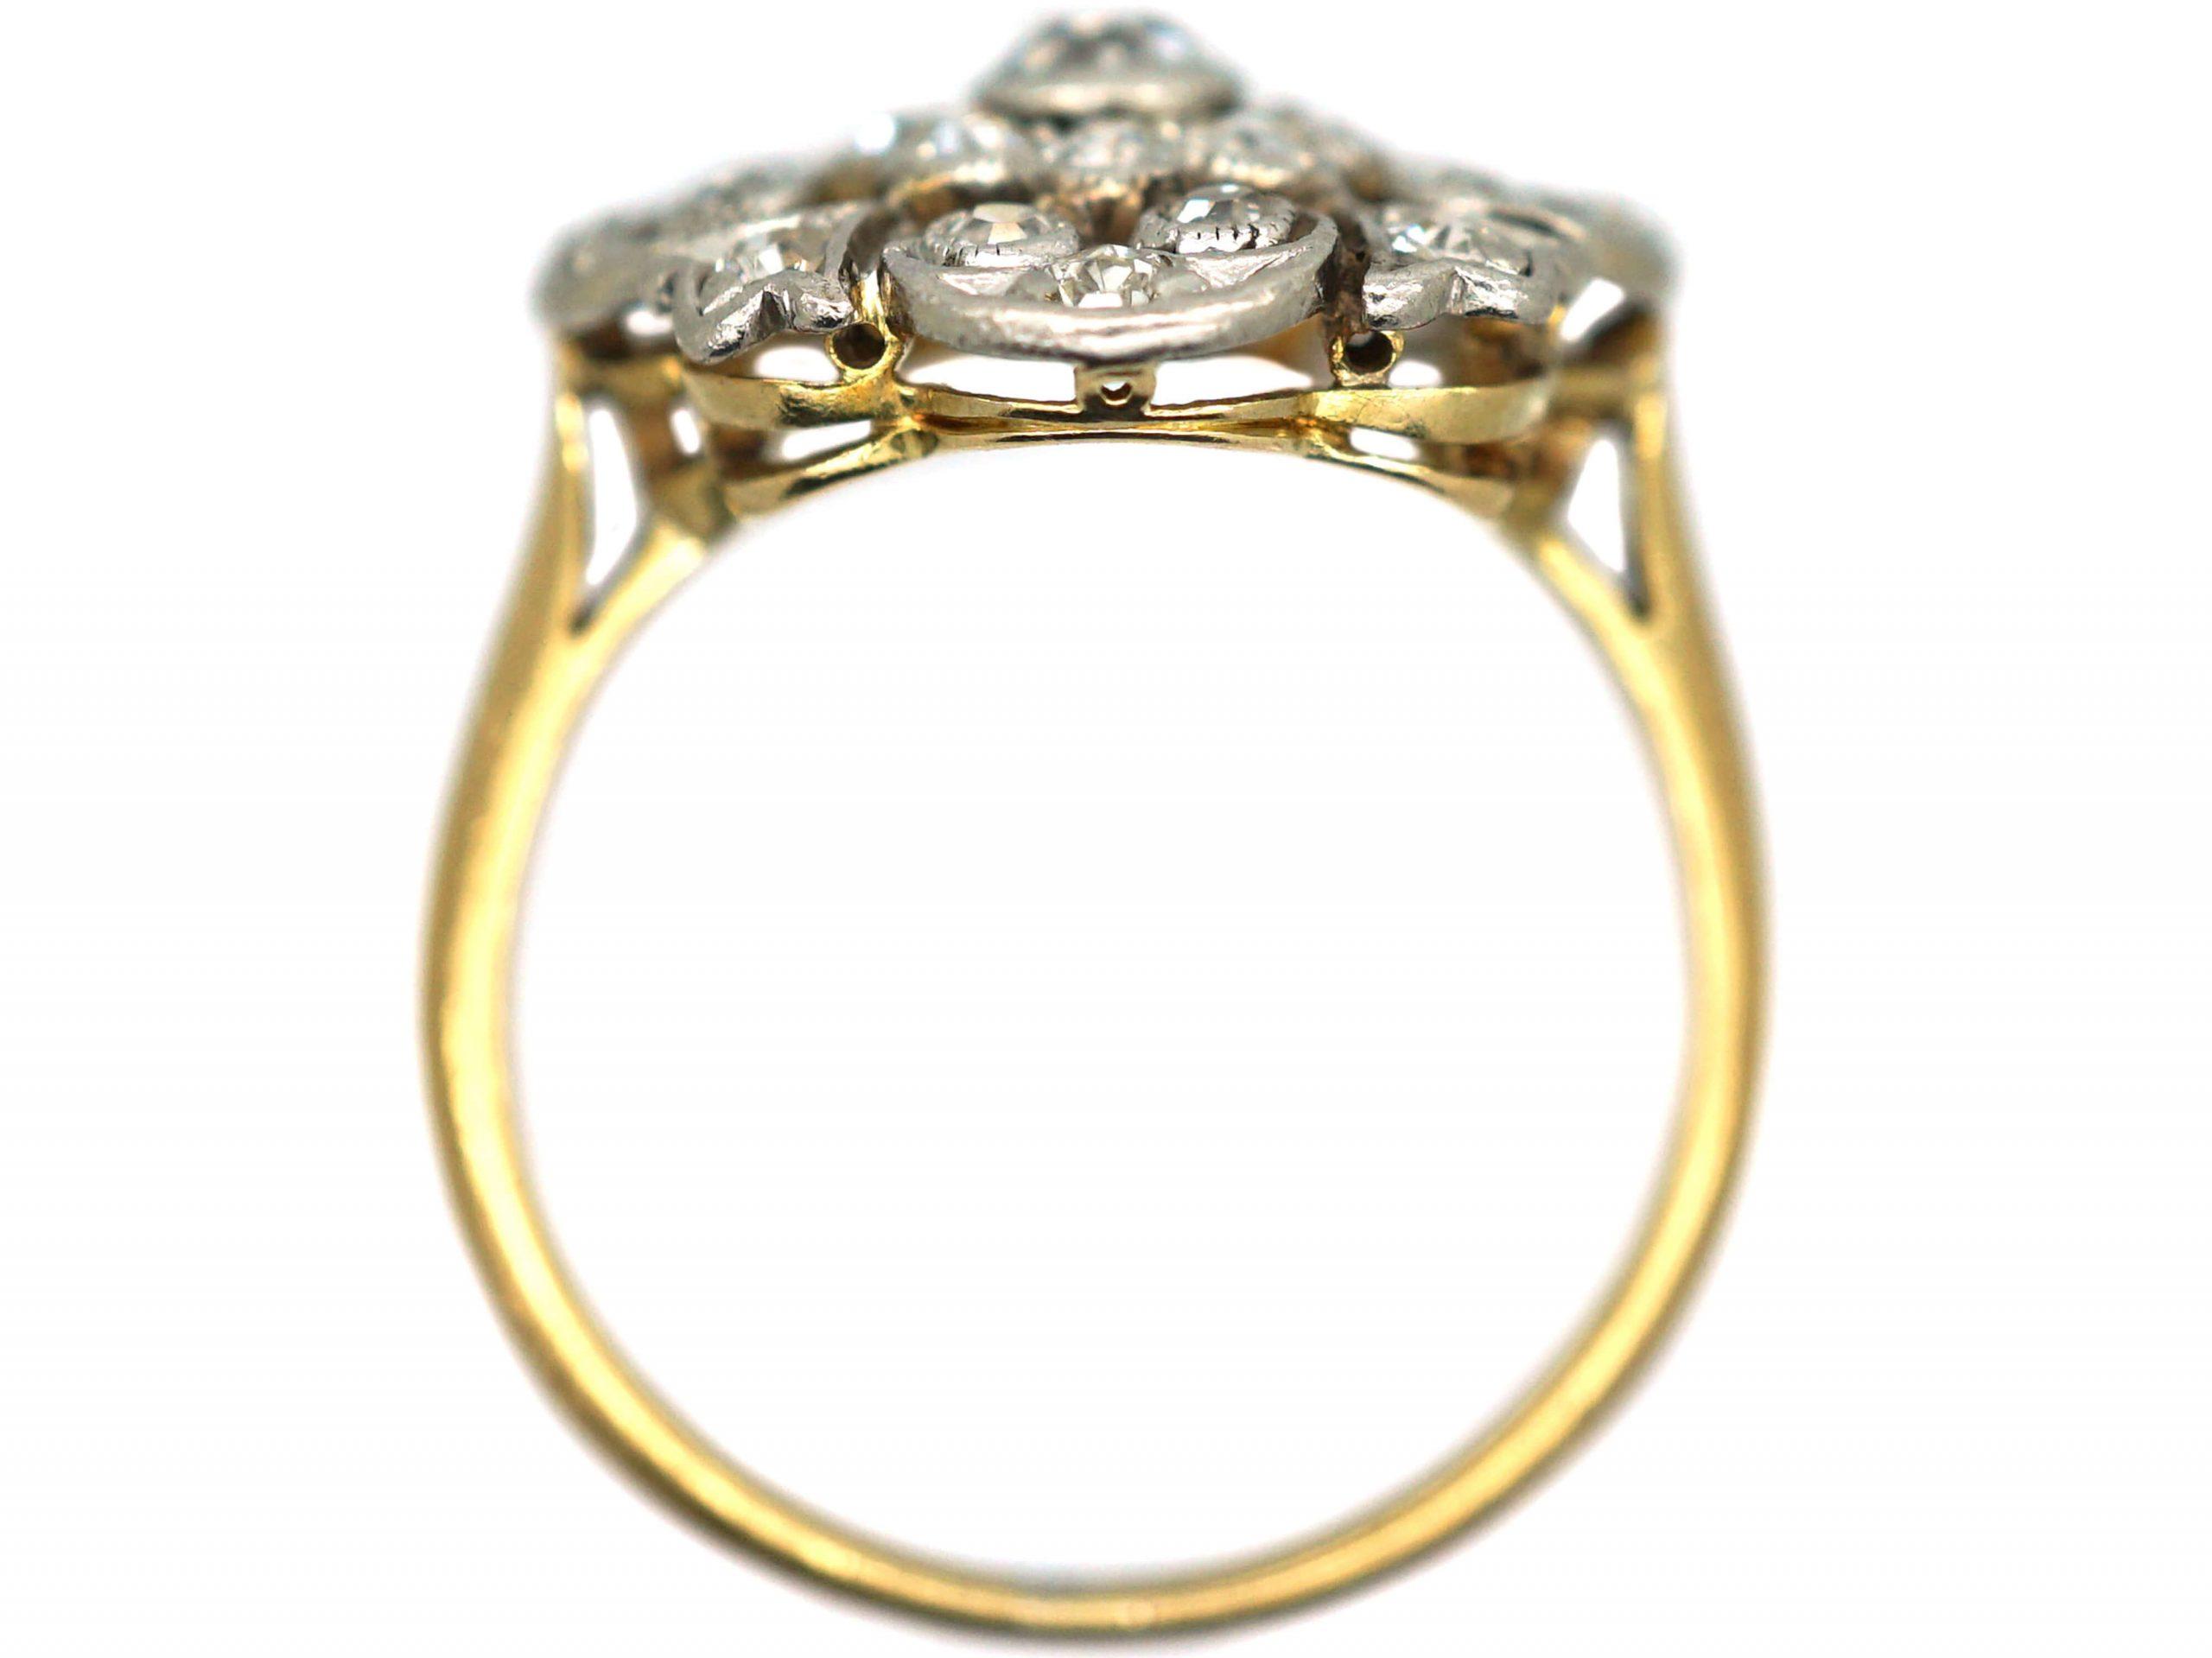 Edwardian 18ct Gold & Platinum, Diamond Openwork Cluster Ring